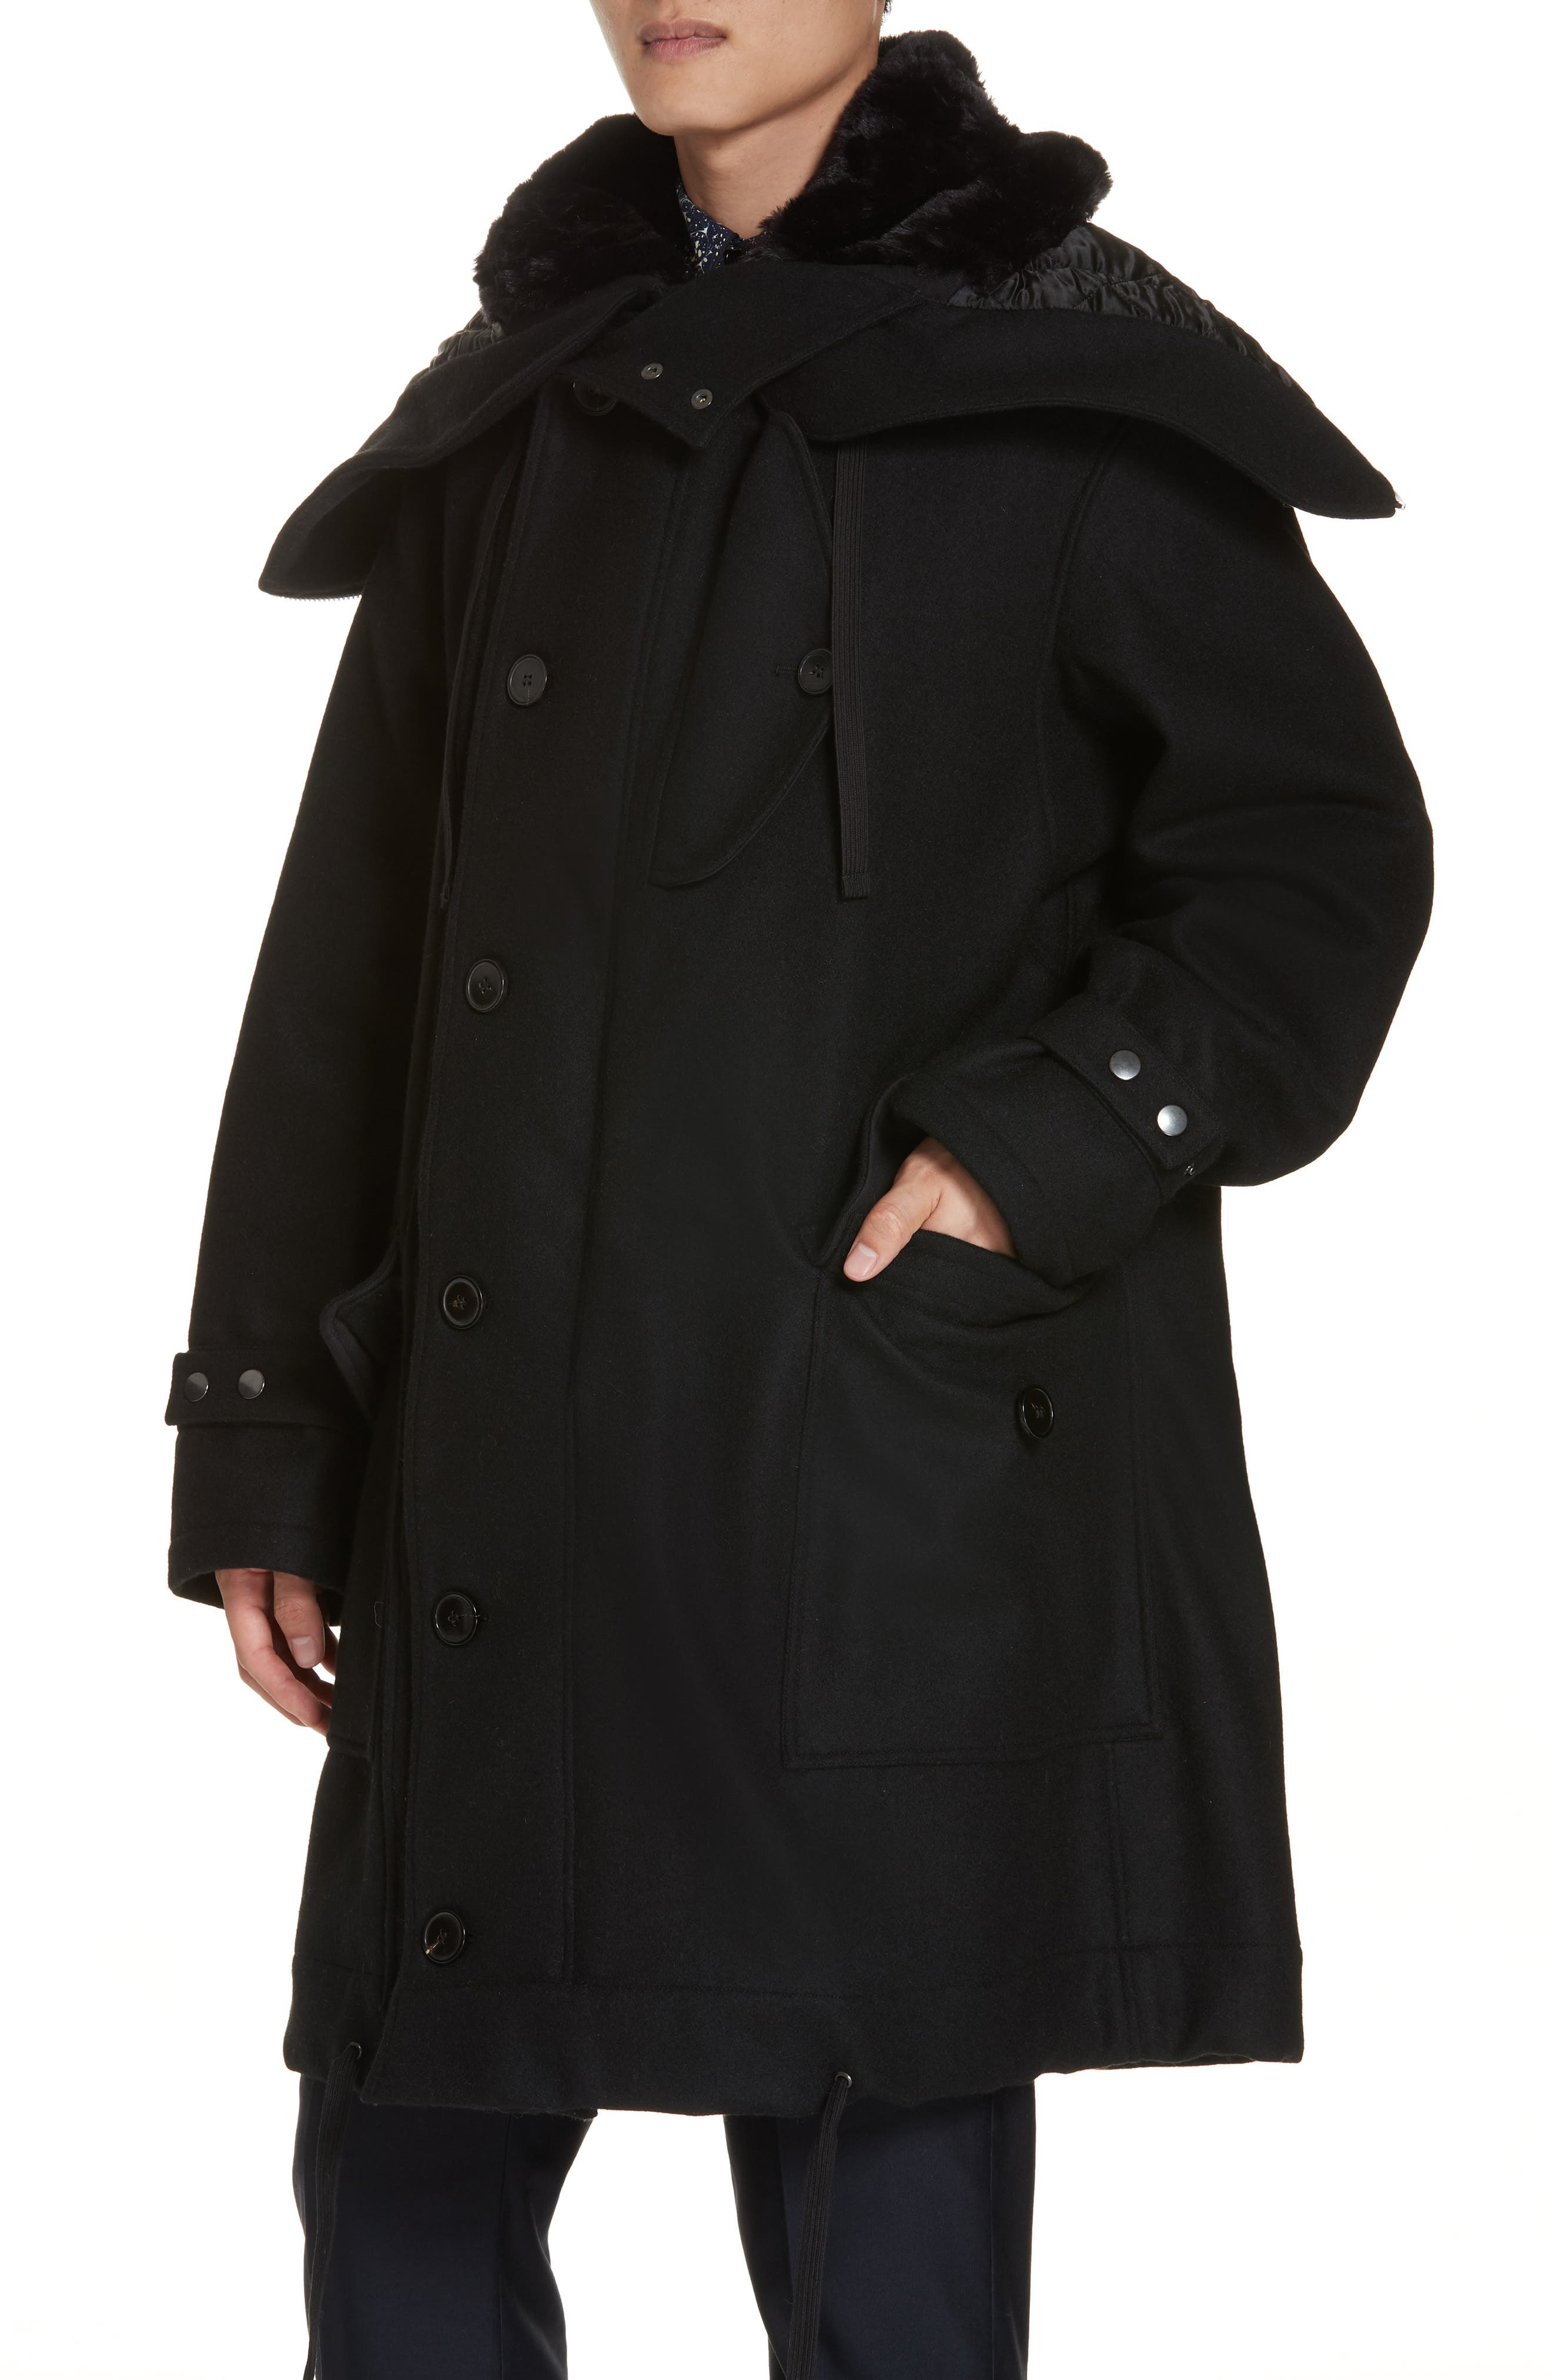 Verreli Hooded Parka with Faux Fur Trim,                             Alternate thumbnail 5, color,                             BLACK 900